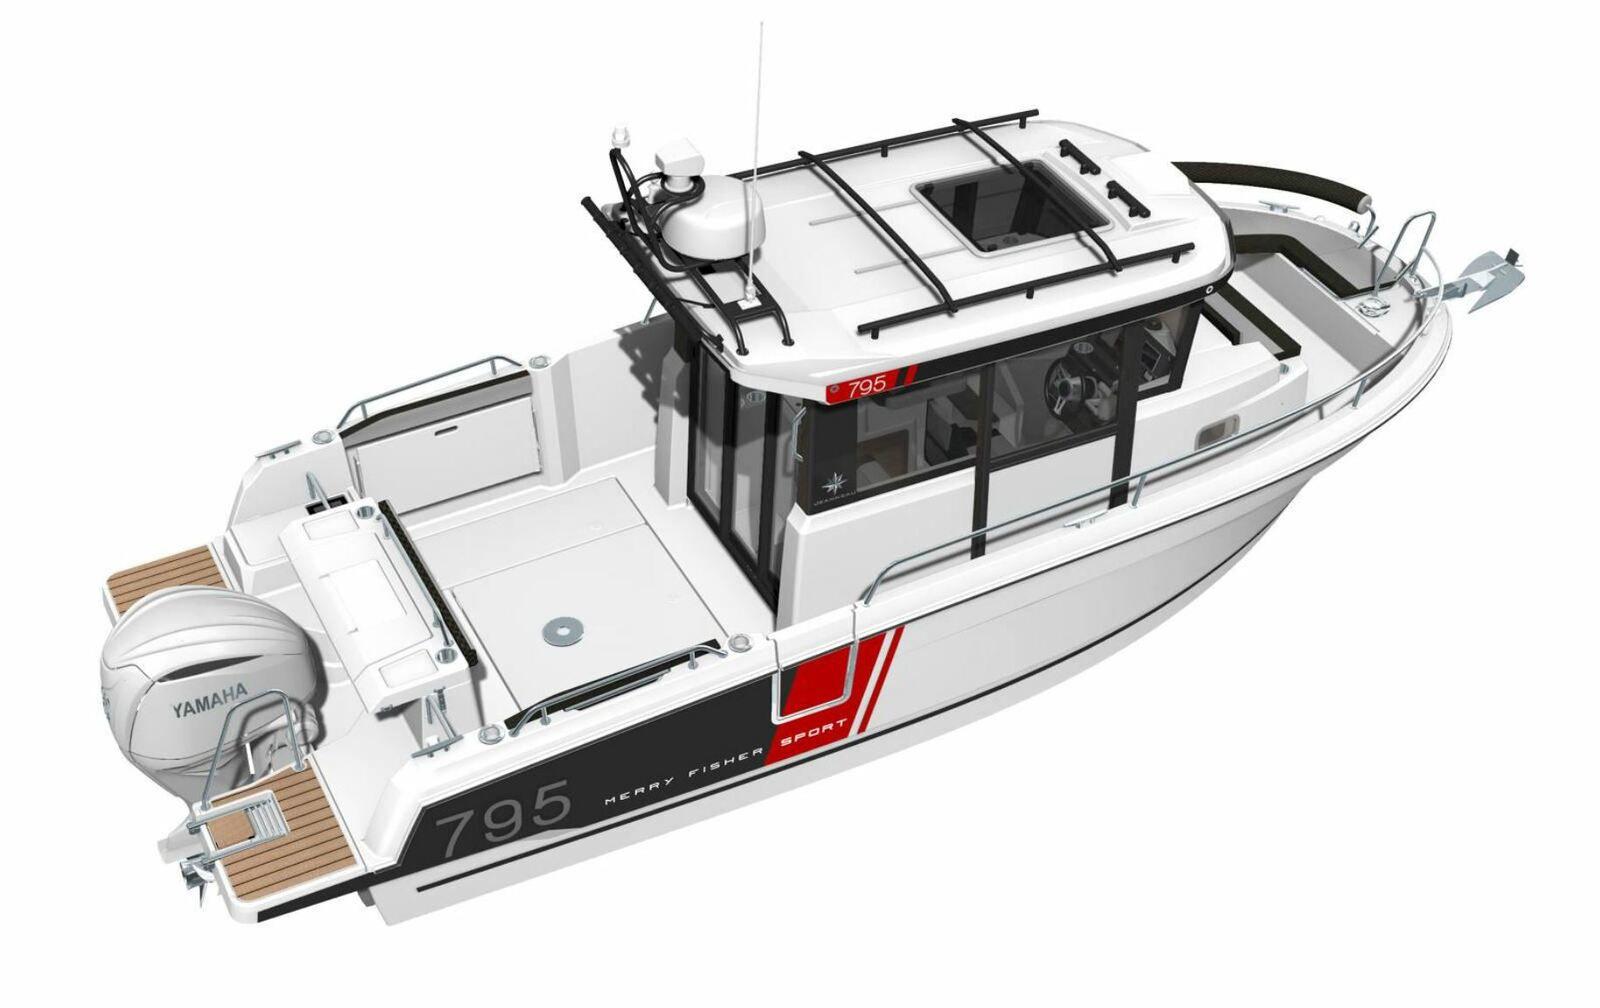 New powerboat 2021 - Jeanneau Merry Fisher Sport 795 Serie 2